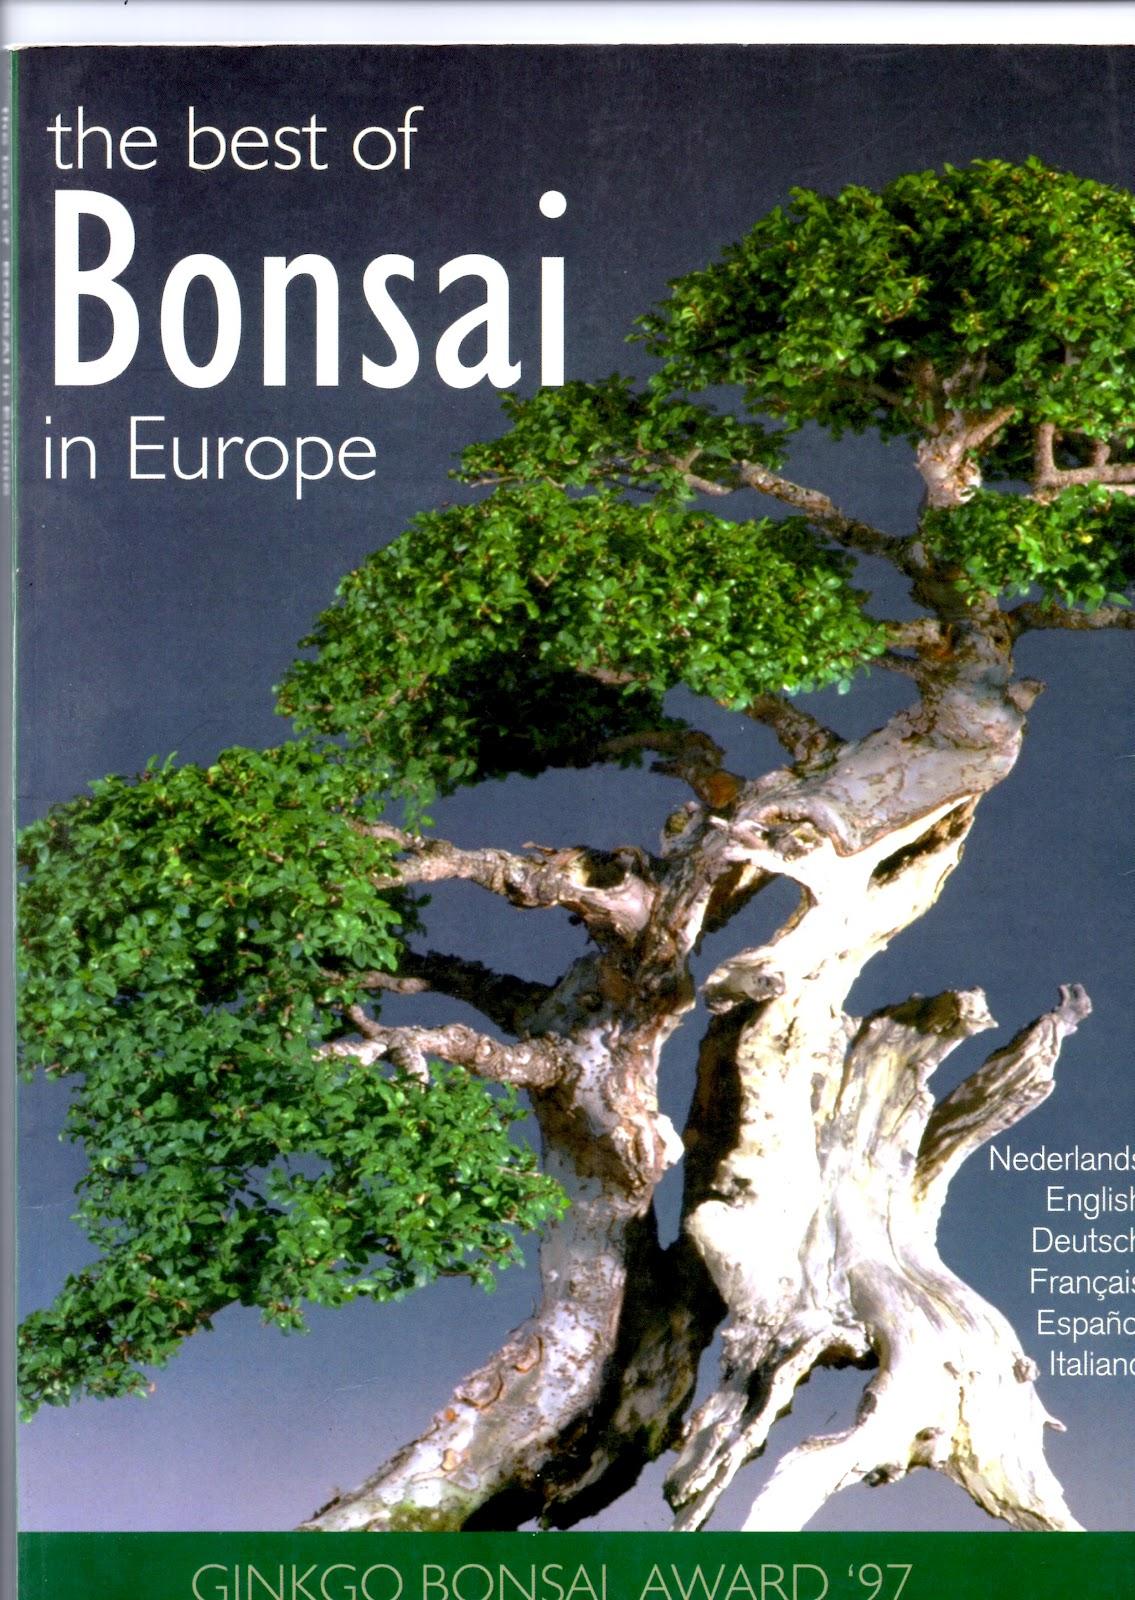 El Tim Bonsai Conozcamos Nuestra Historia 1 1997 I Ginkgo Bonsai